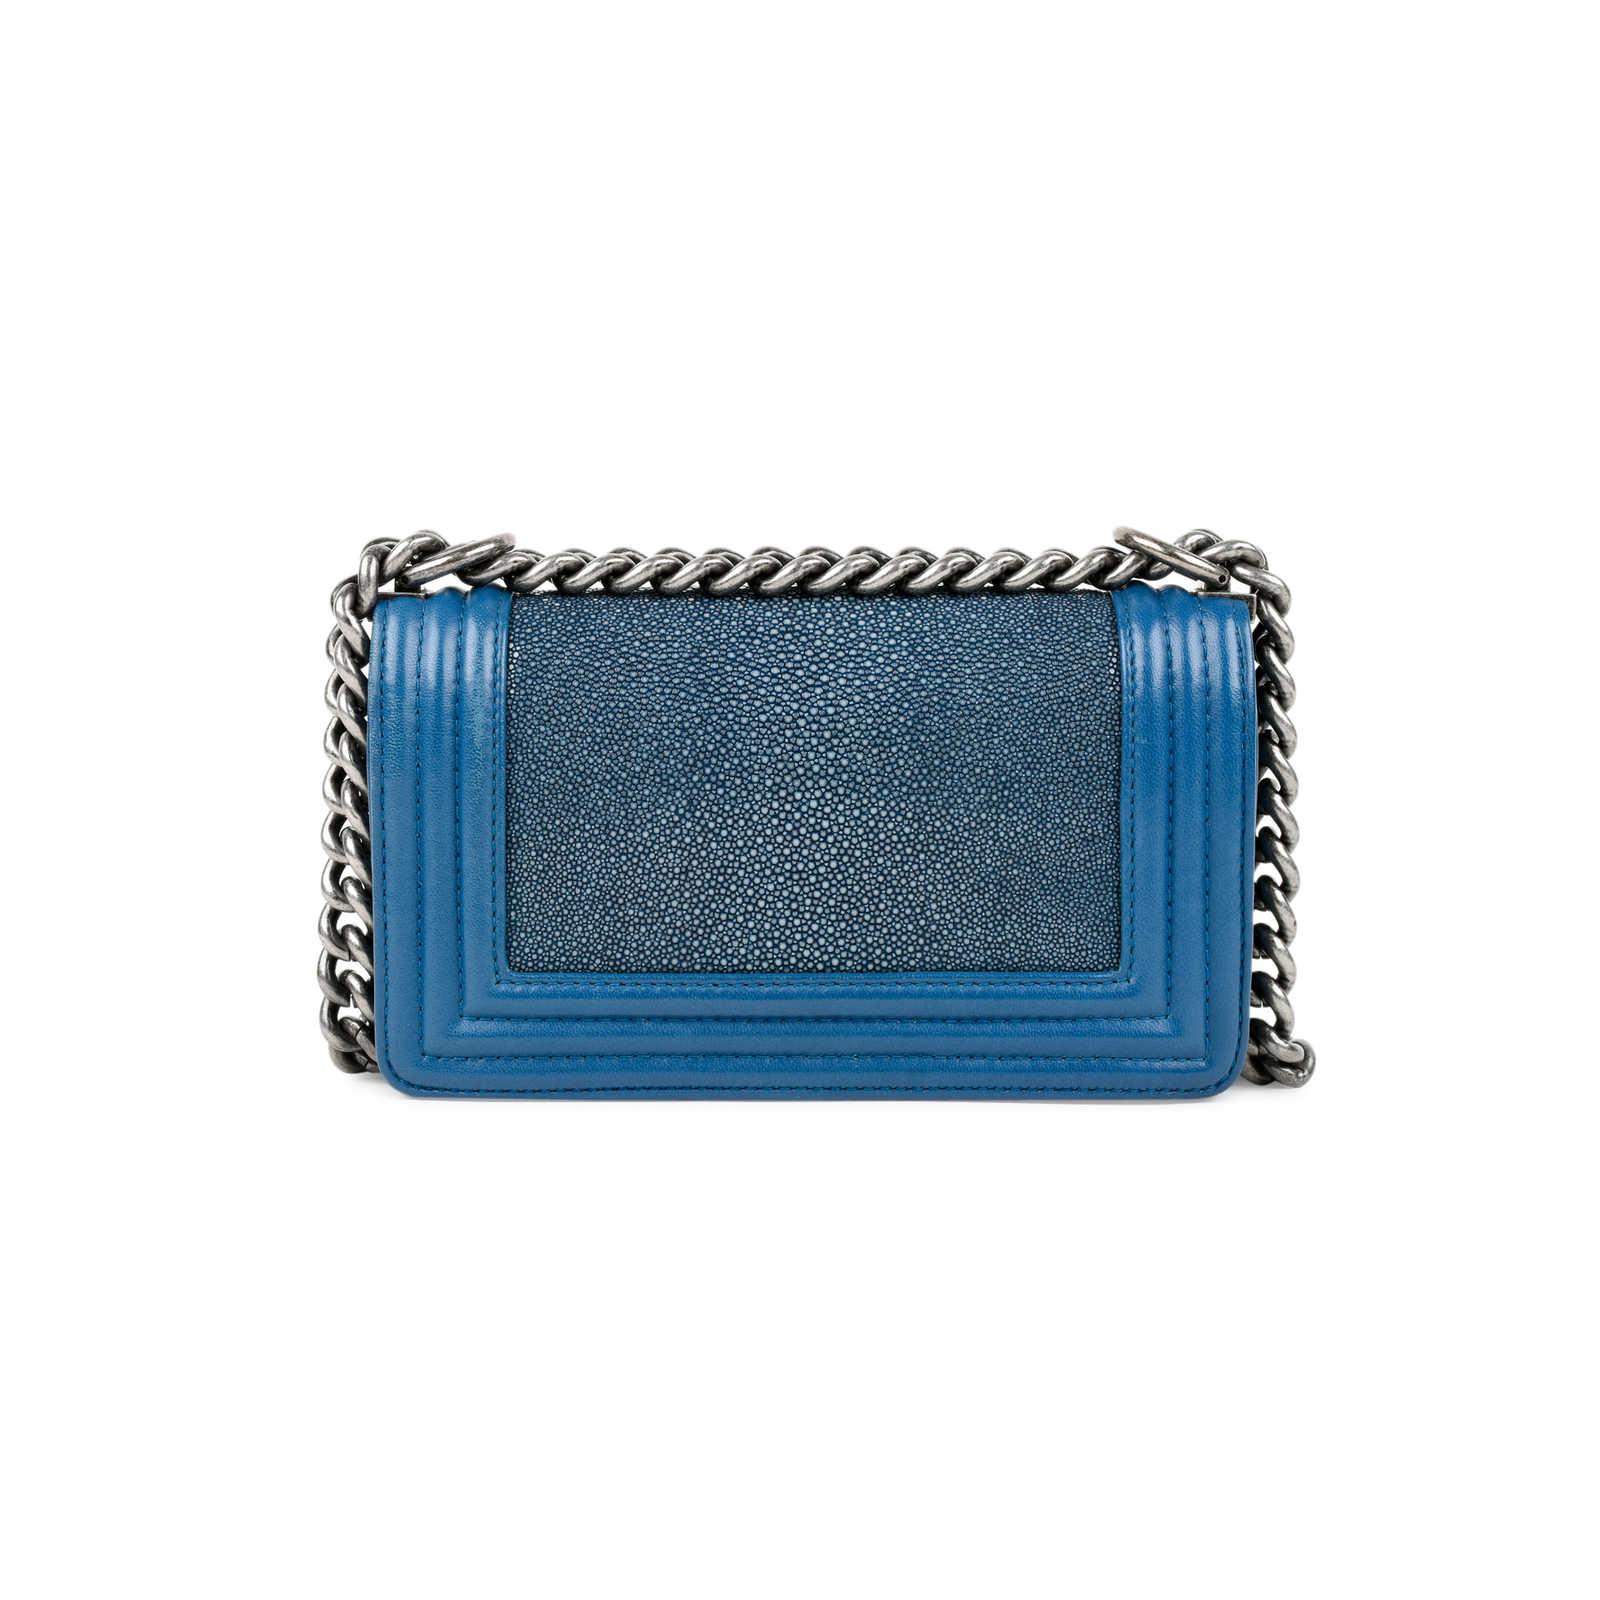 2aa5ecd57d7e ... Authentic Second Hand Chanel Stingray Boy Bag (PSS-235-00084) -  Thumbnail ...